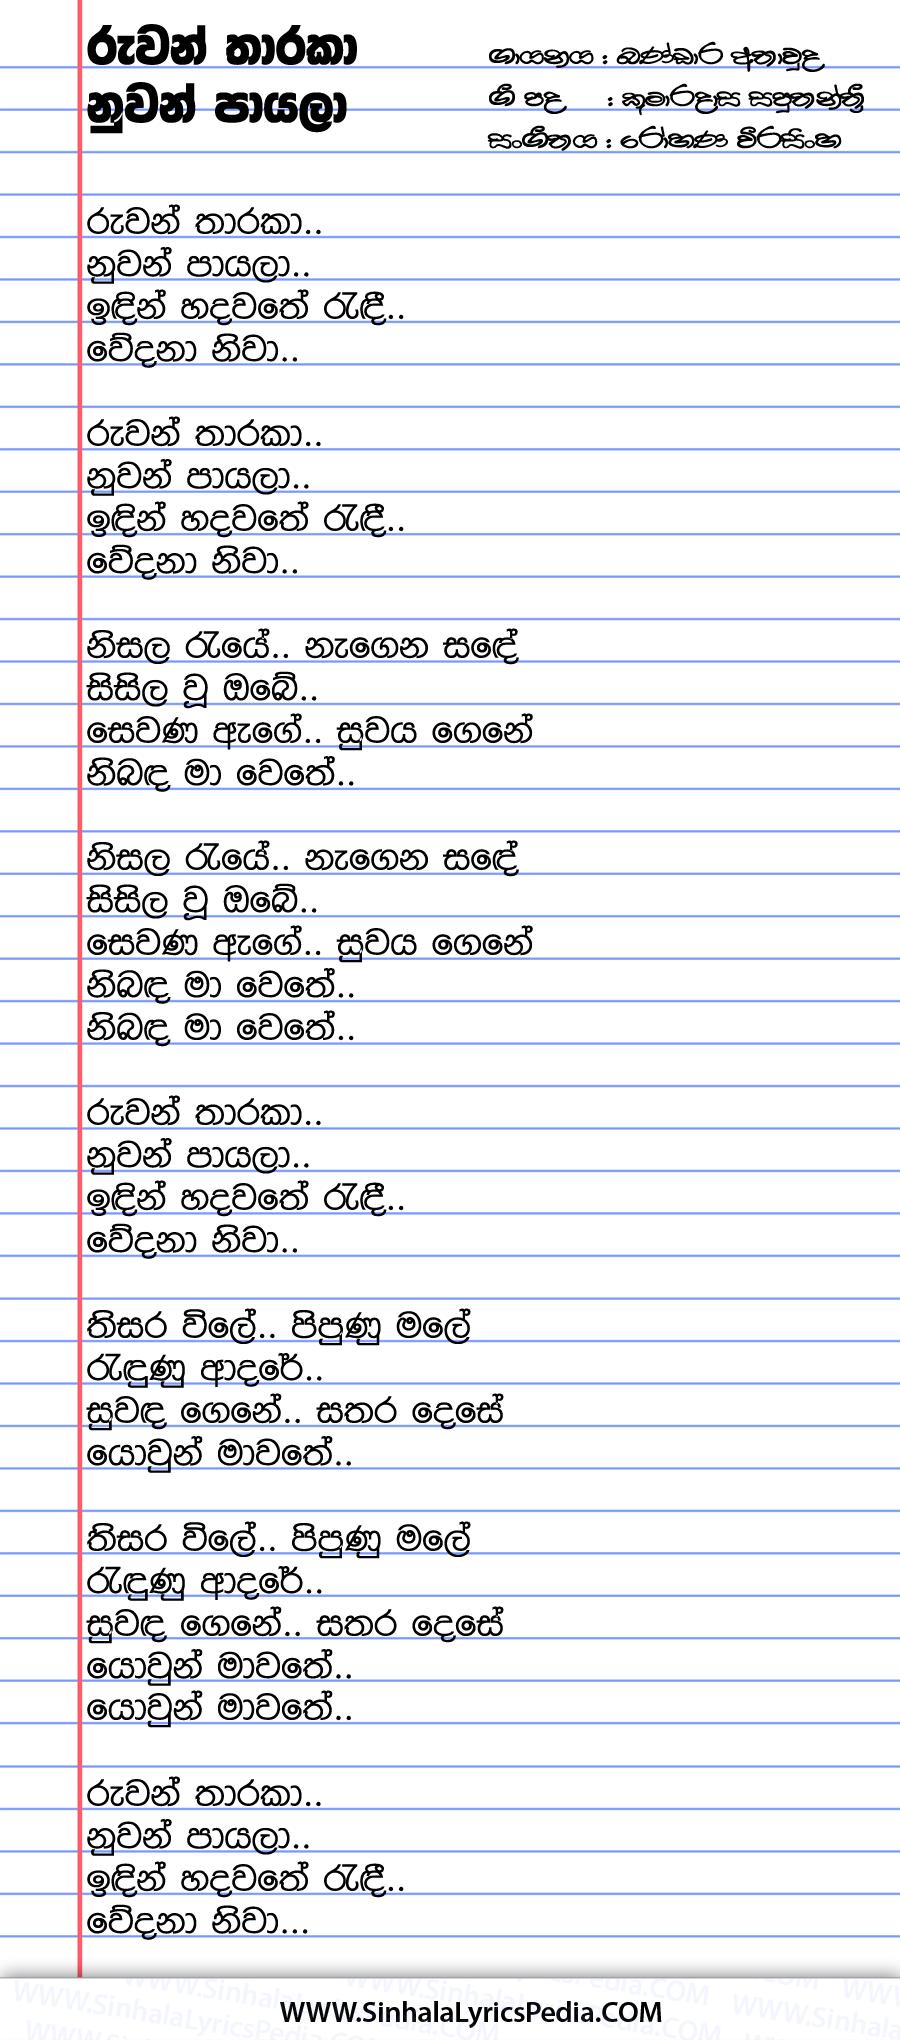 Ruwan Tharaka Nuwan Payala Song Lyrics